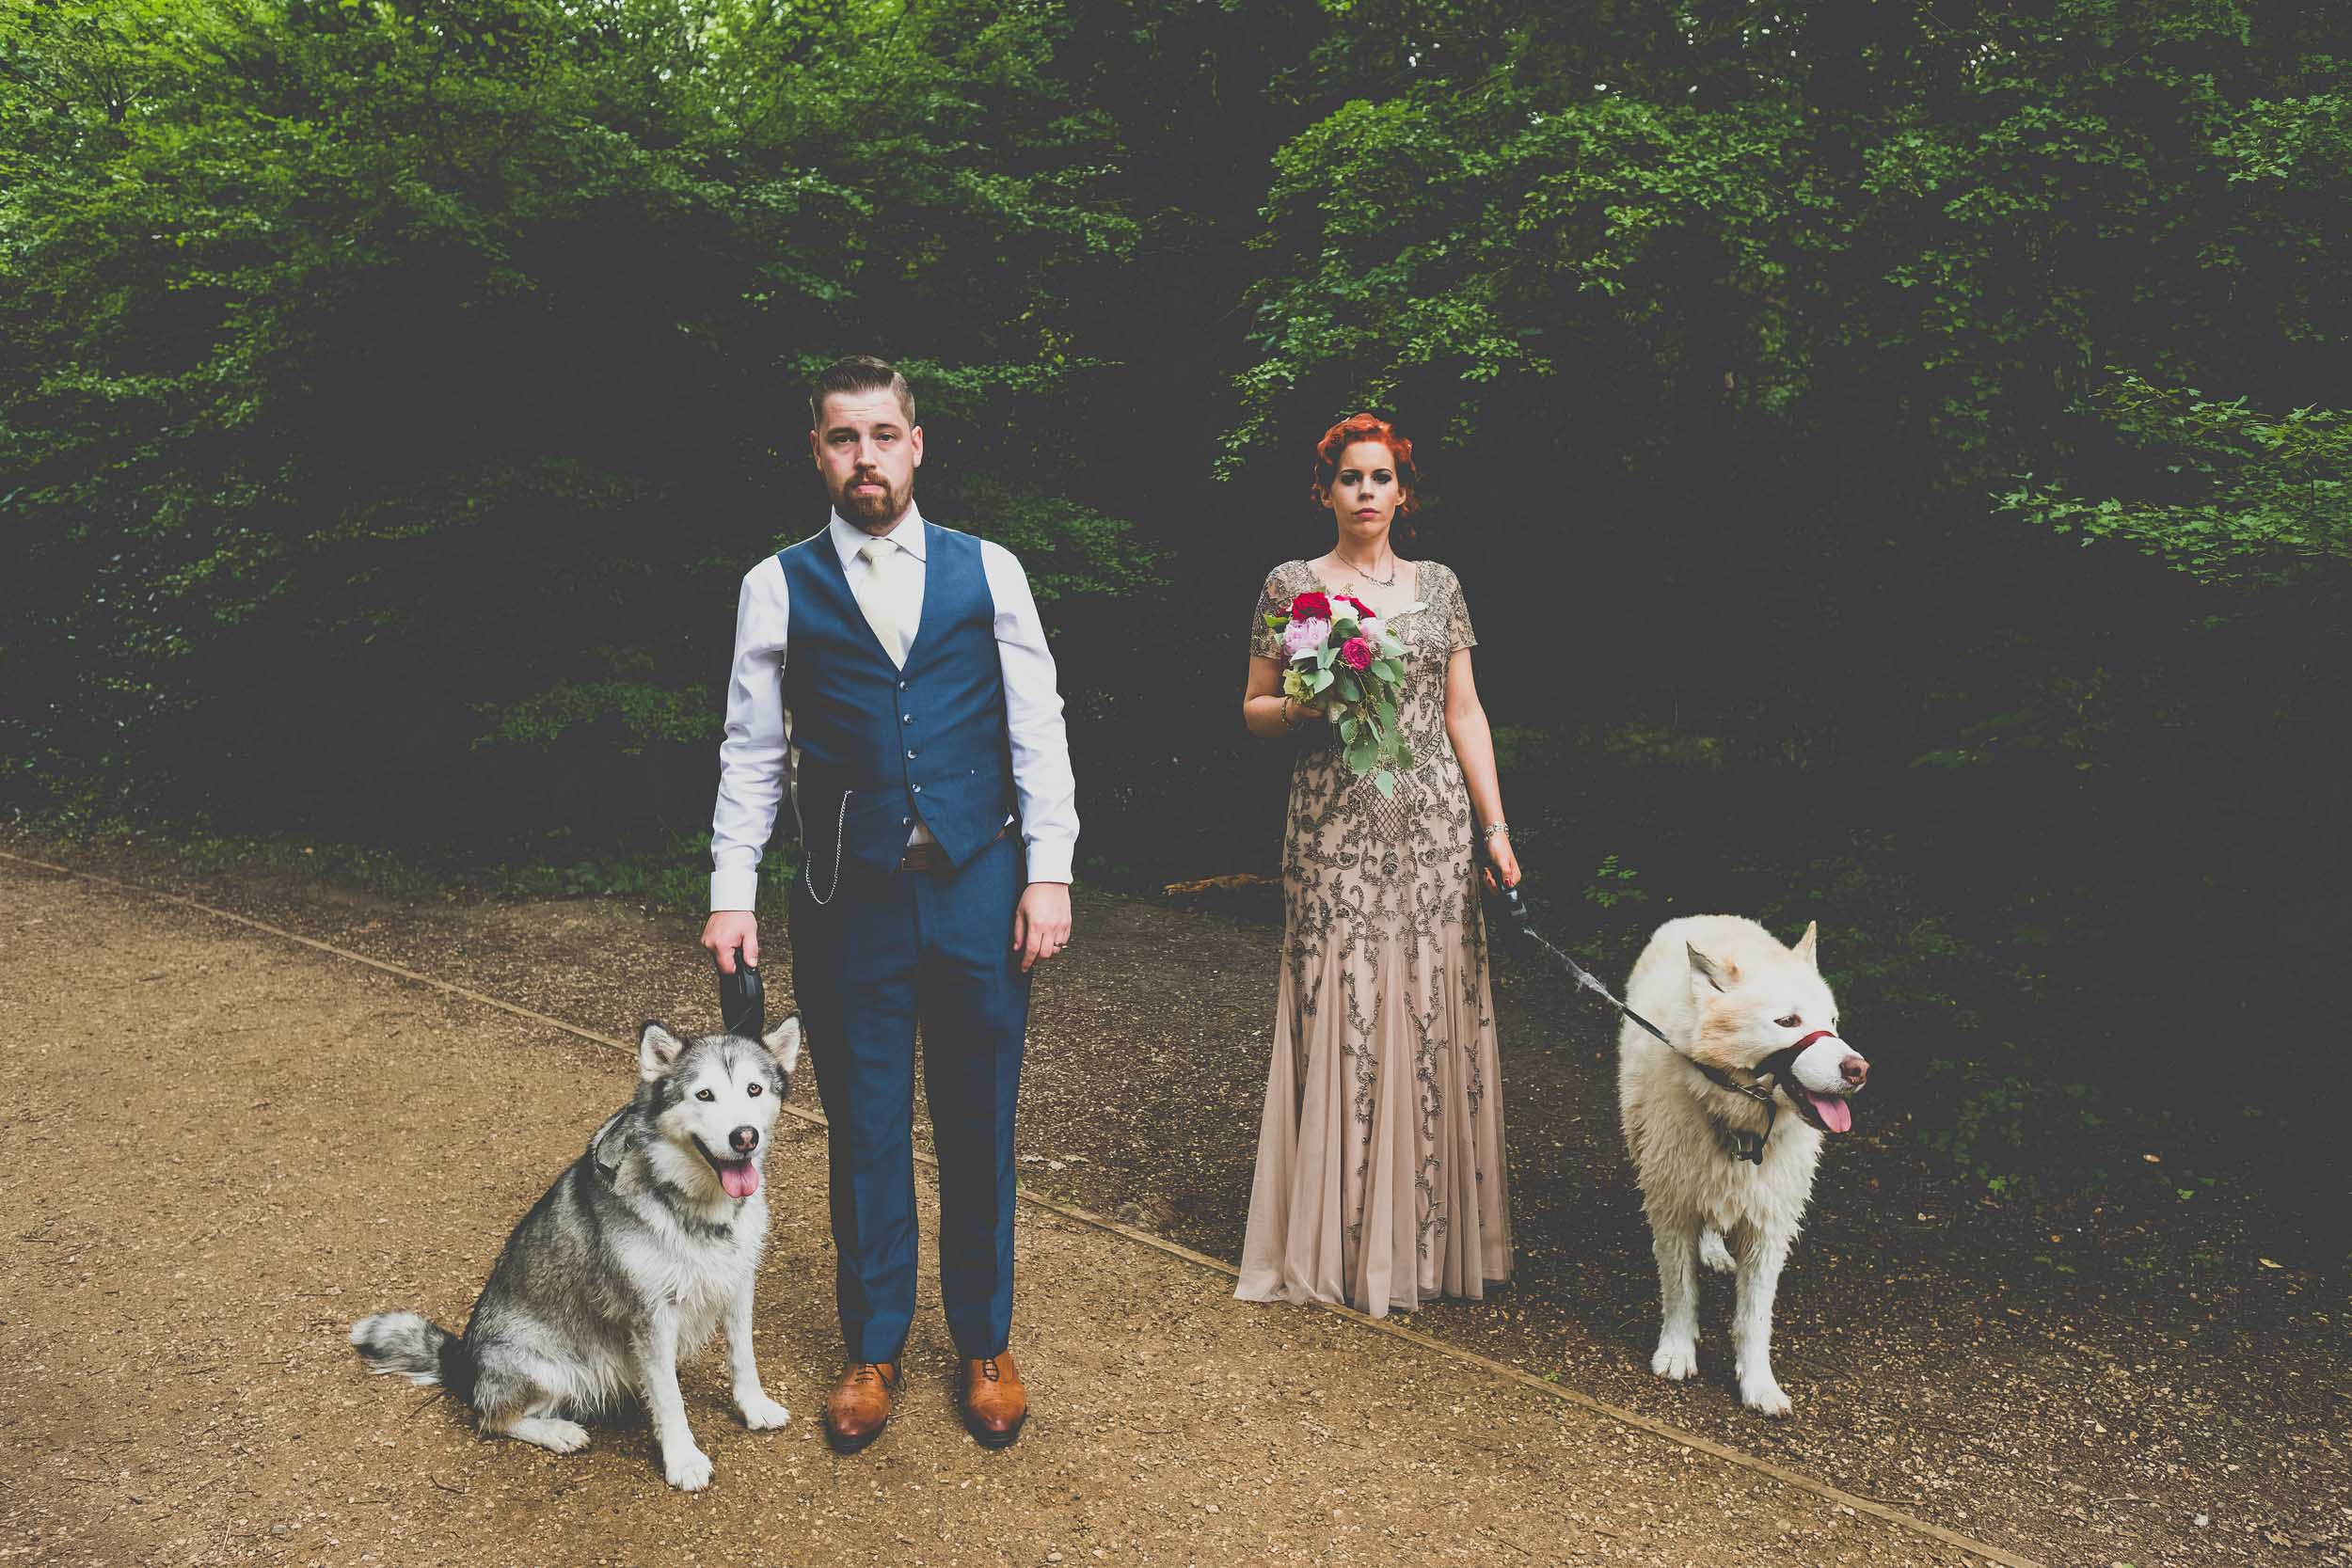 queen-elizabeths-hunting-lodge-epping-forest-wedding260.jpg